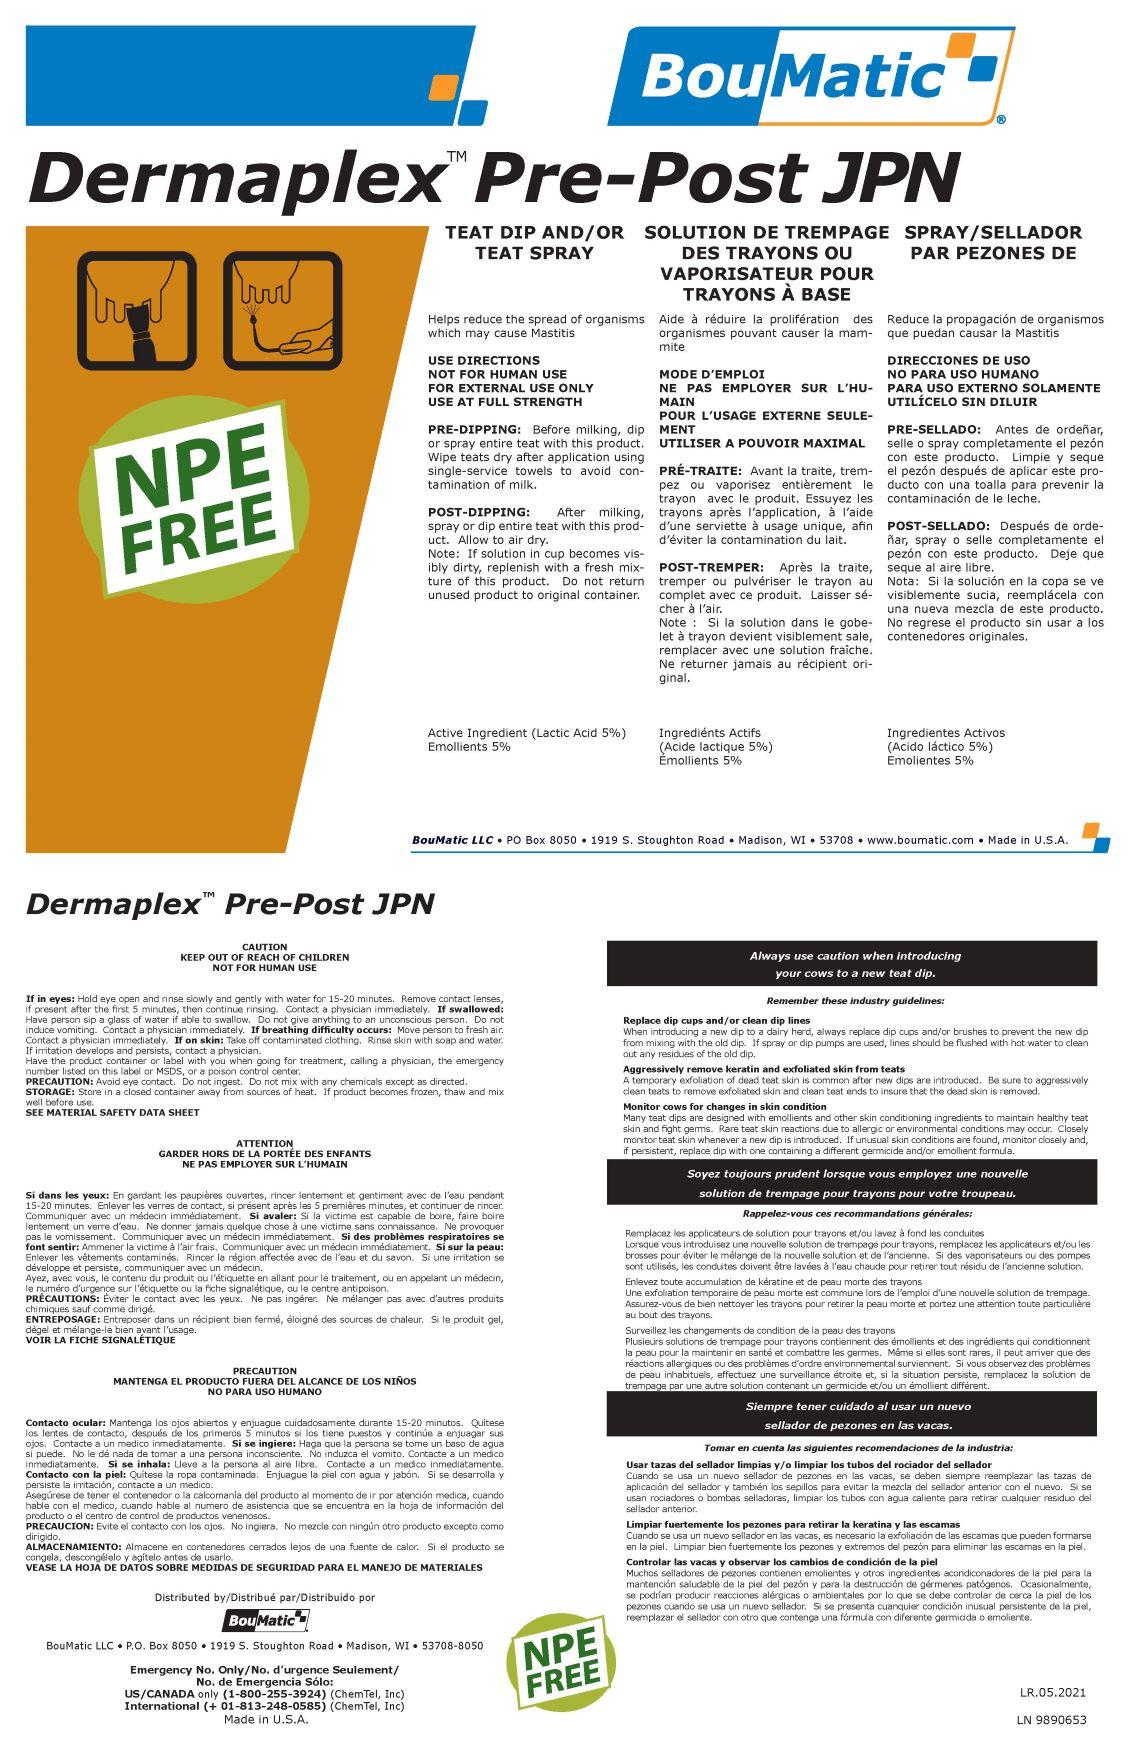 Dermaplex PrePost JPN label Rev